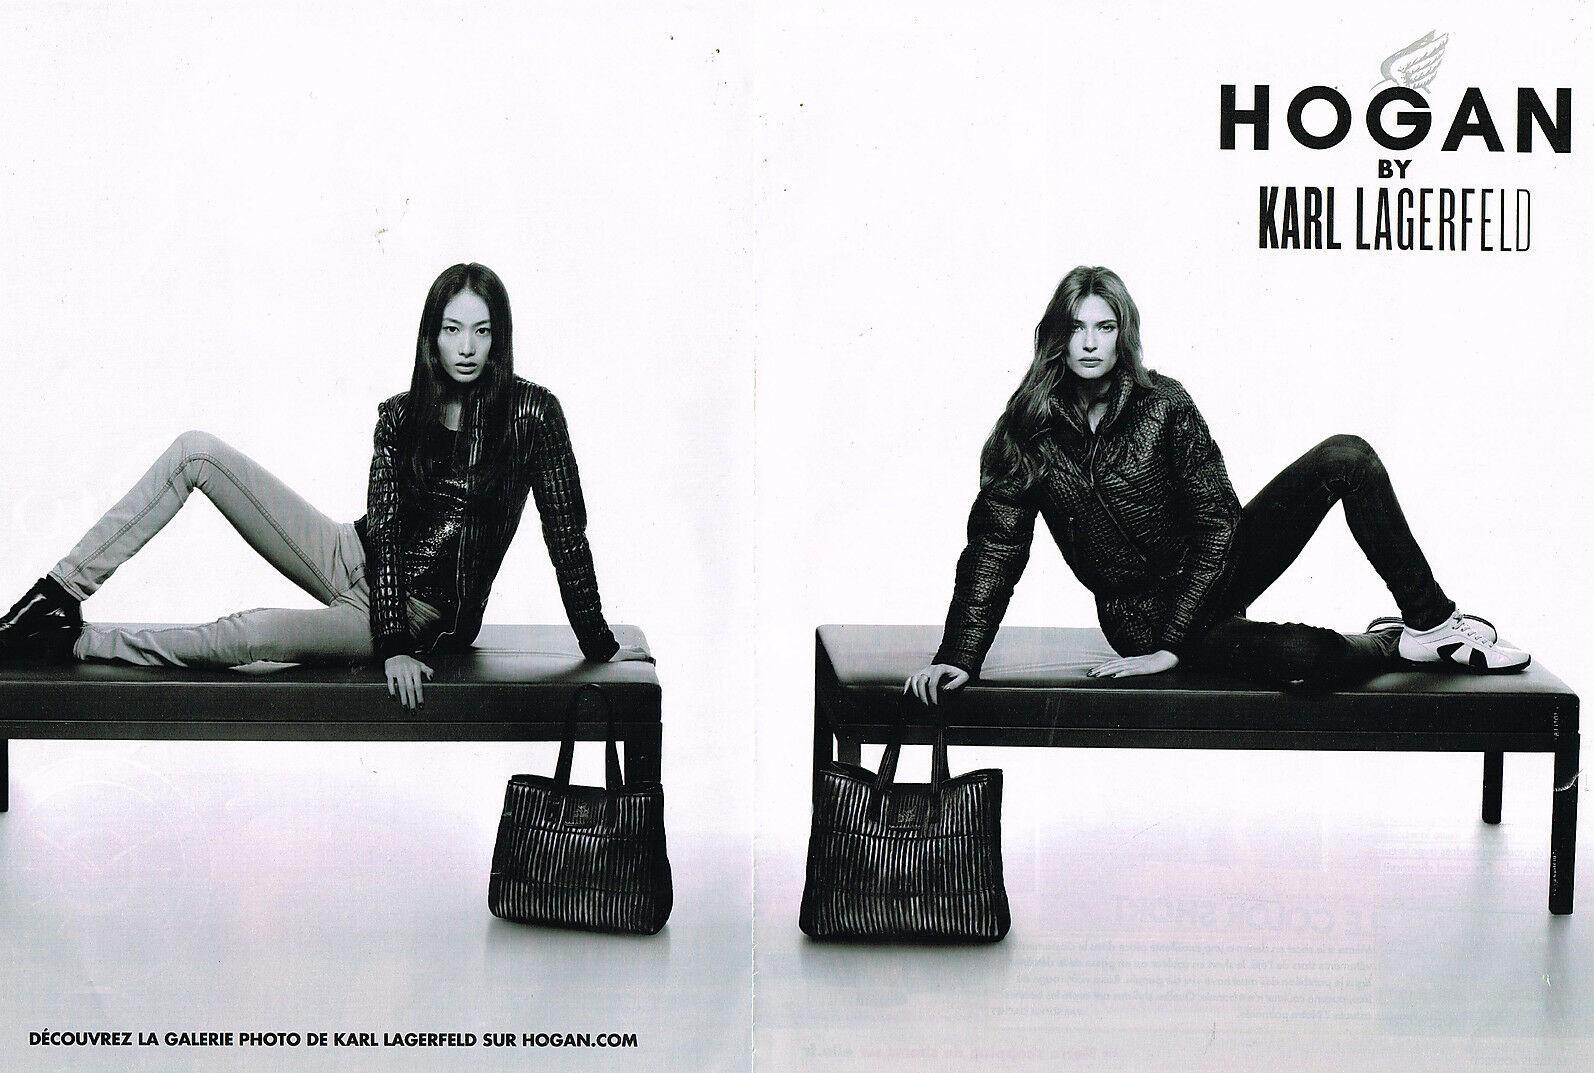 2011 HOGAN BY KARL LAGERFELD